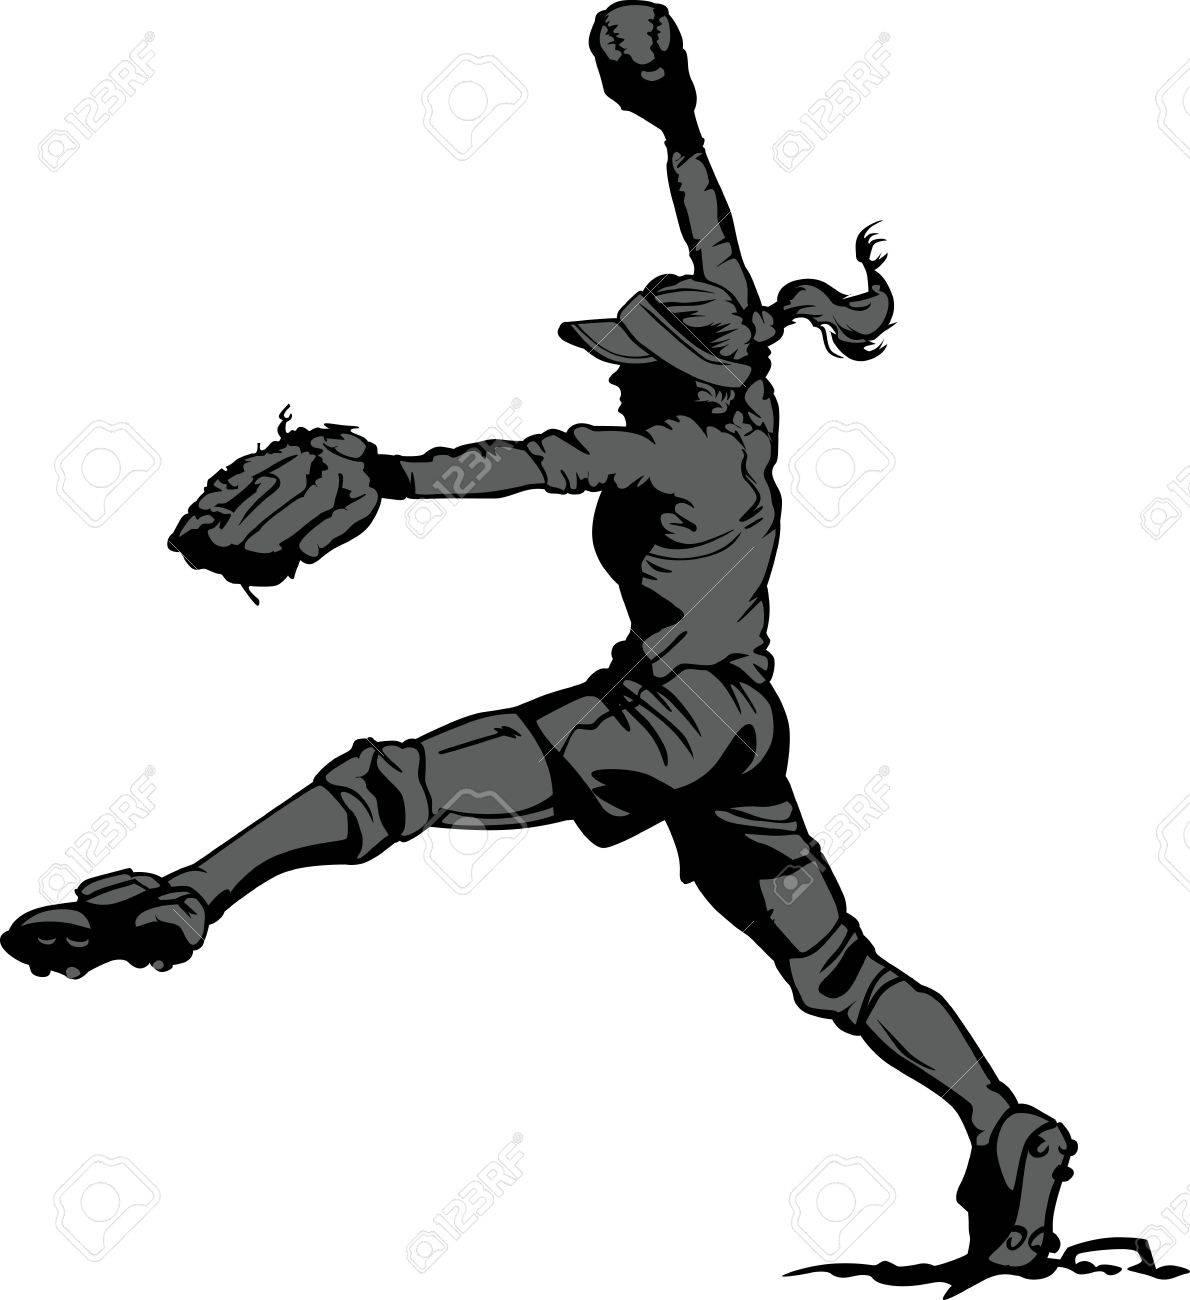 Images Softball Players Softball Player Pitching